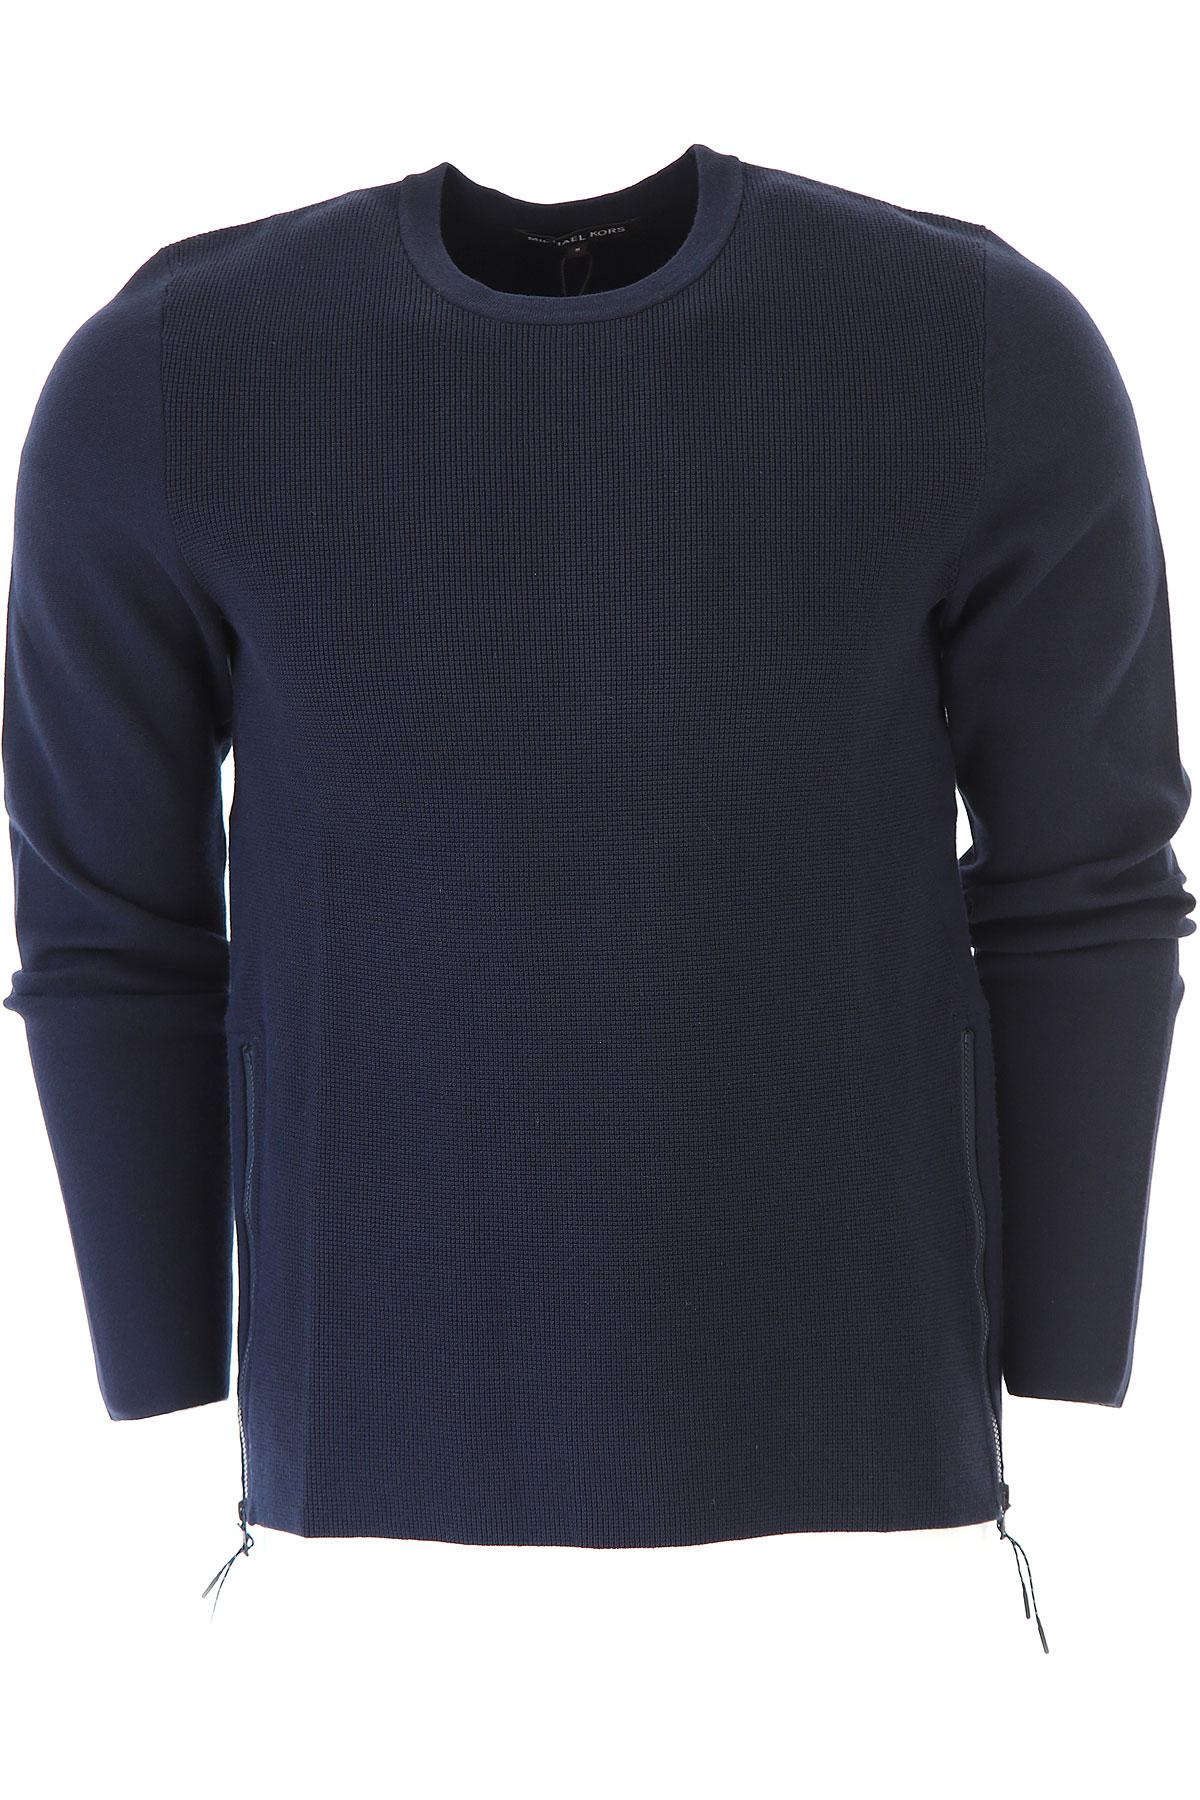 Michael Kors Sweater for Men Jumper, Midnight, Viscose, 2019, L M S XL